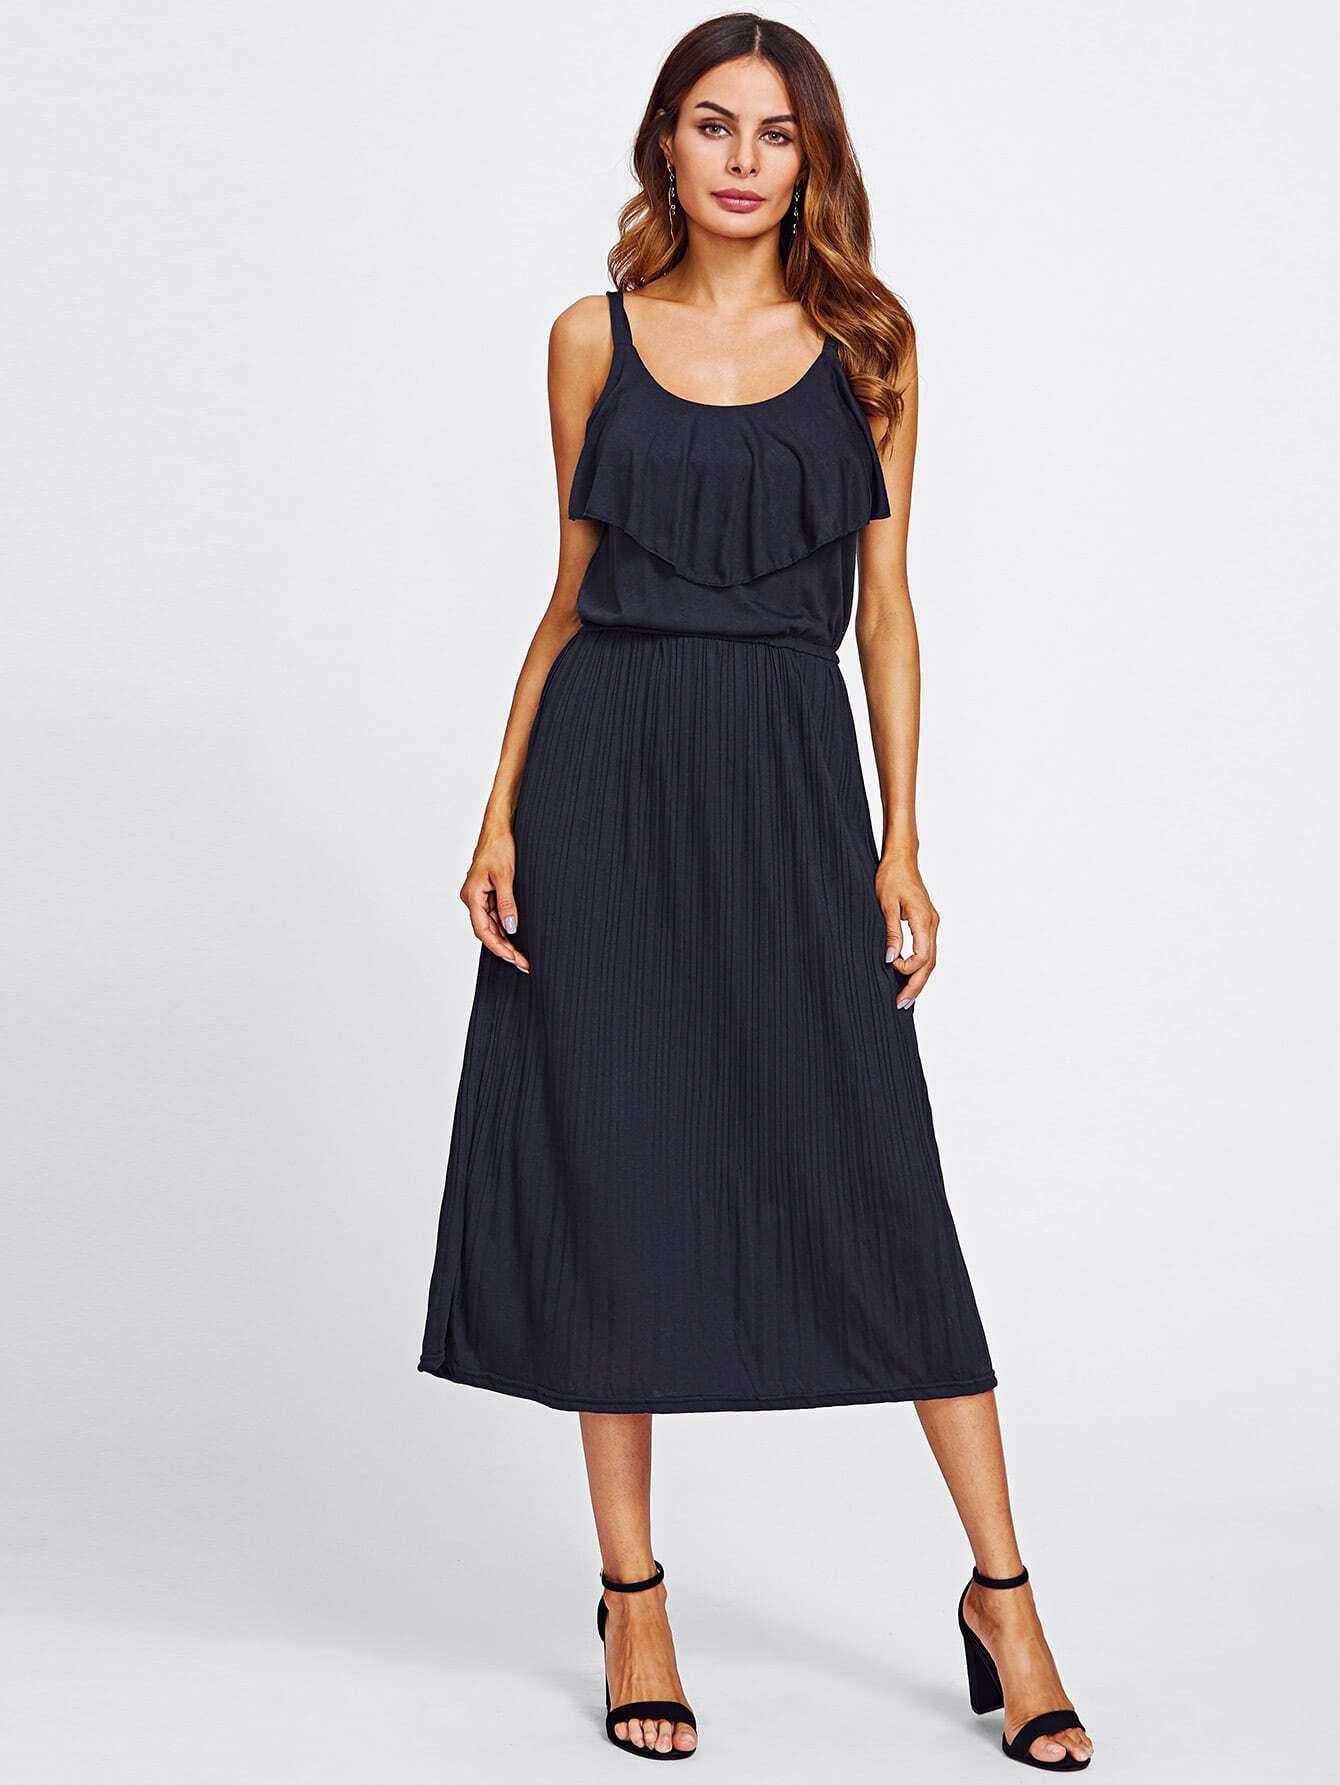 Frill Layered Pleated Dress